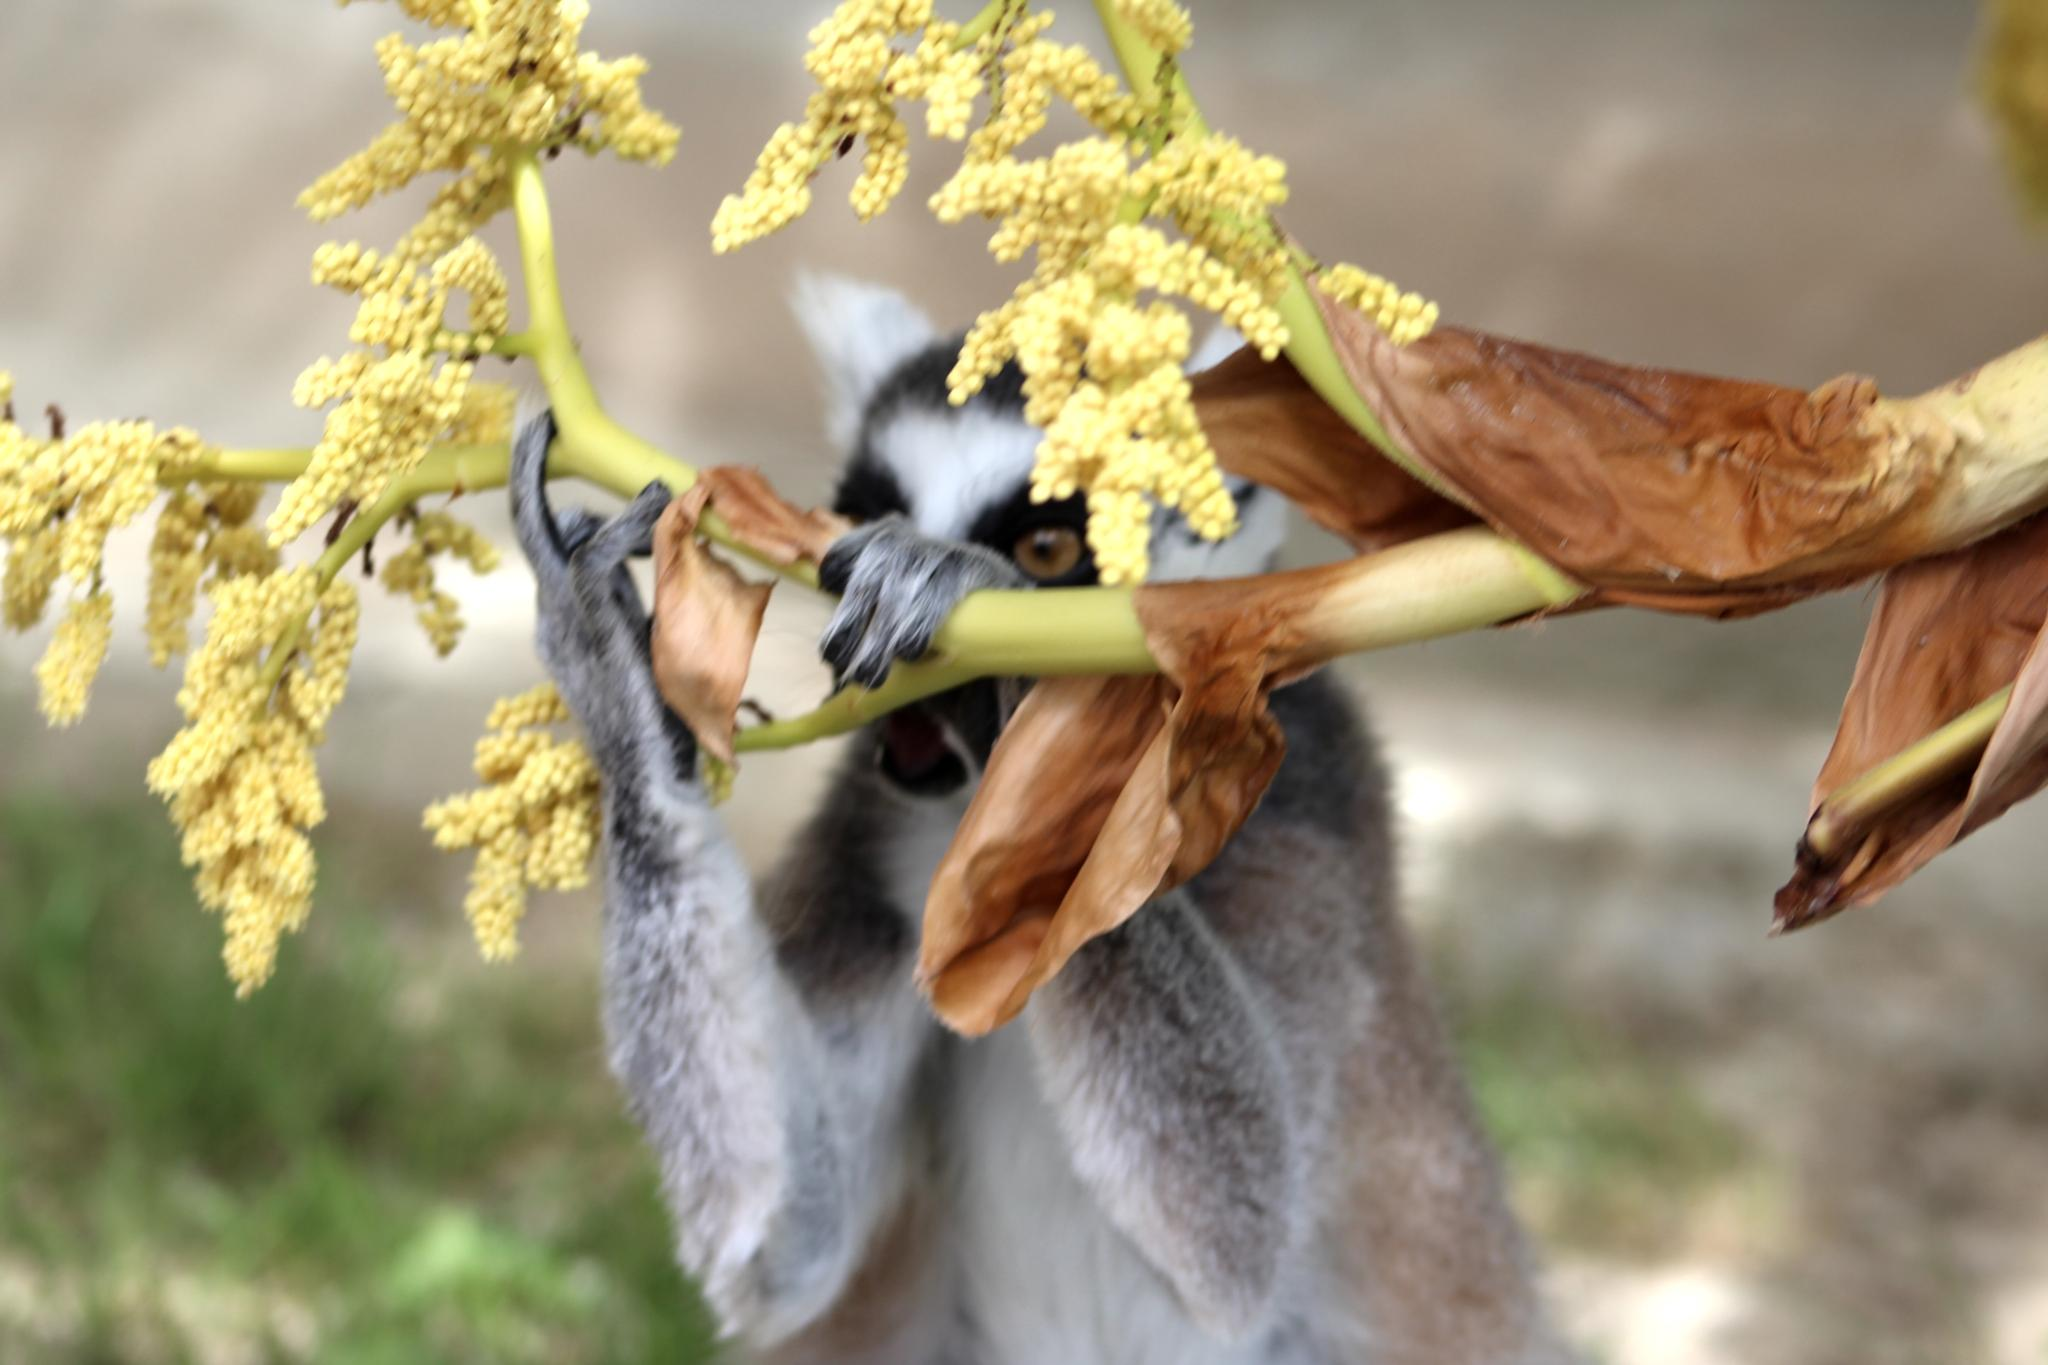 Lemurs at the Safari Park by LoryC